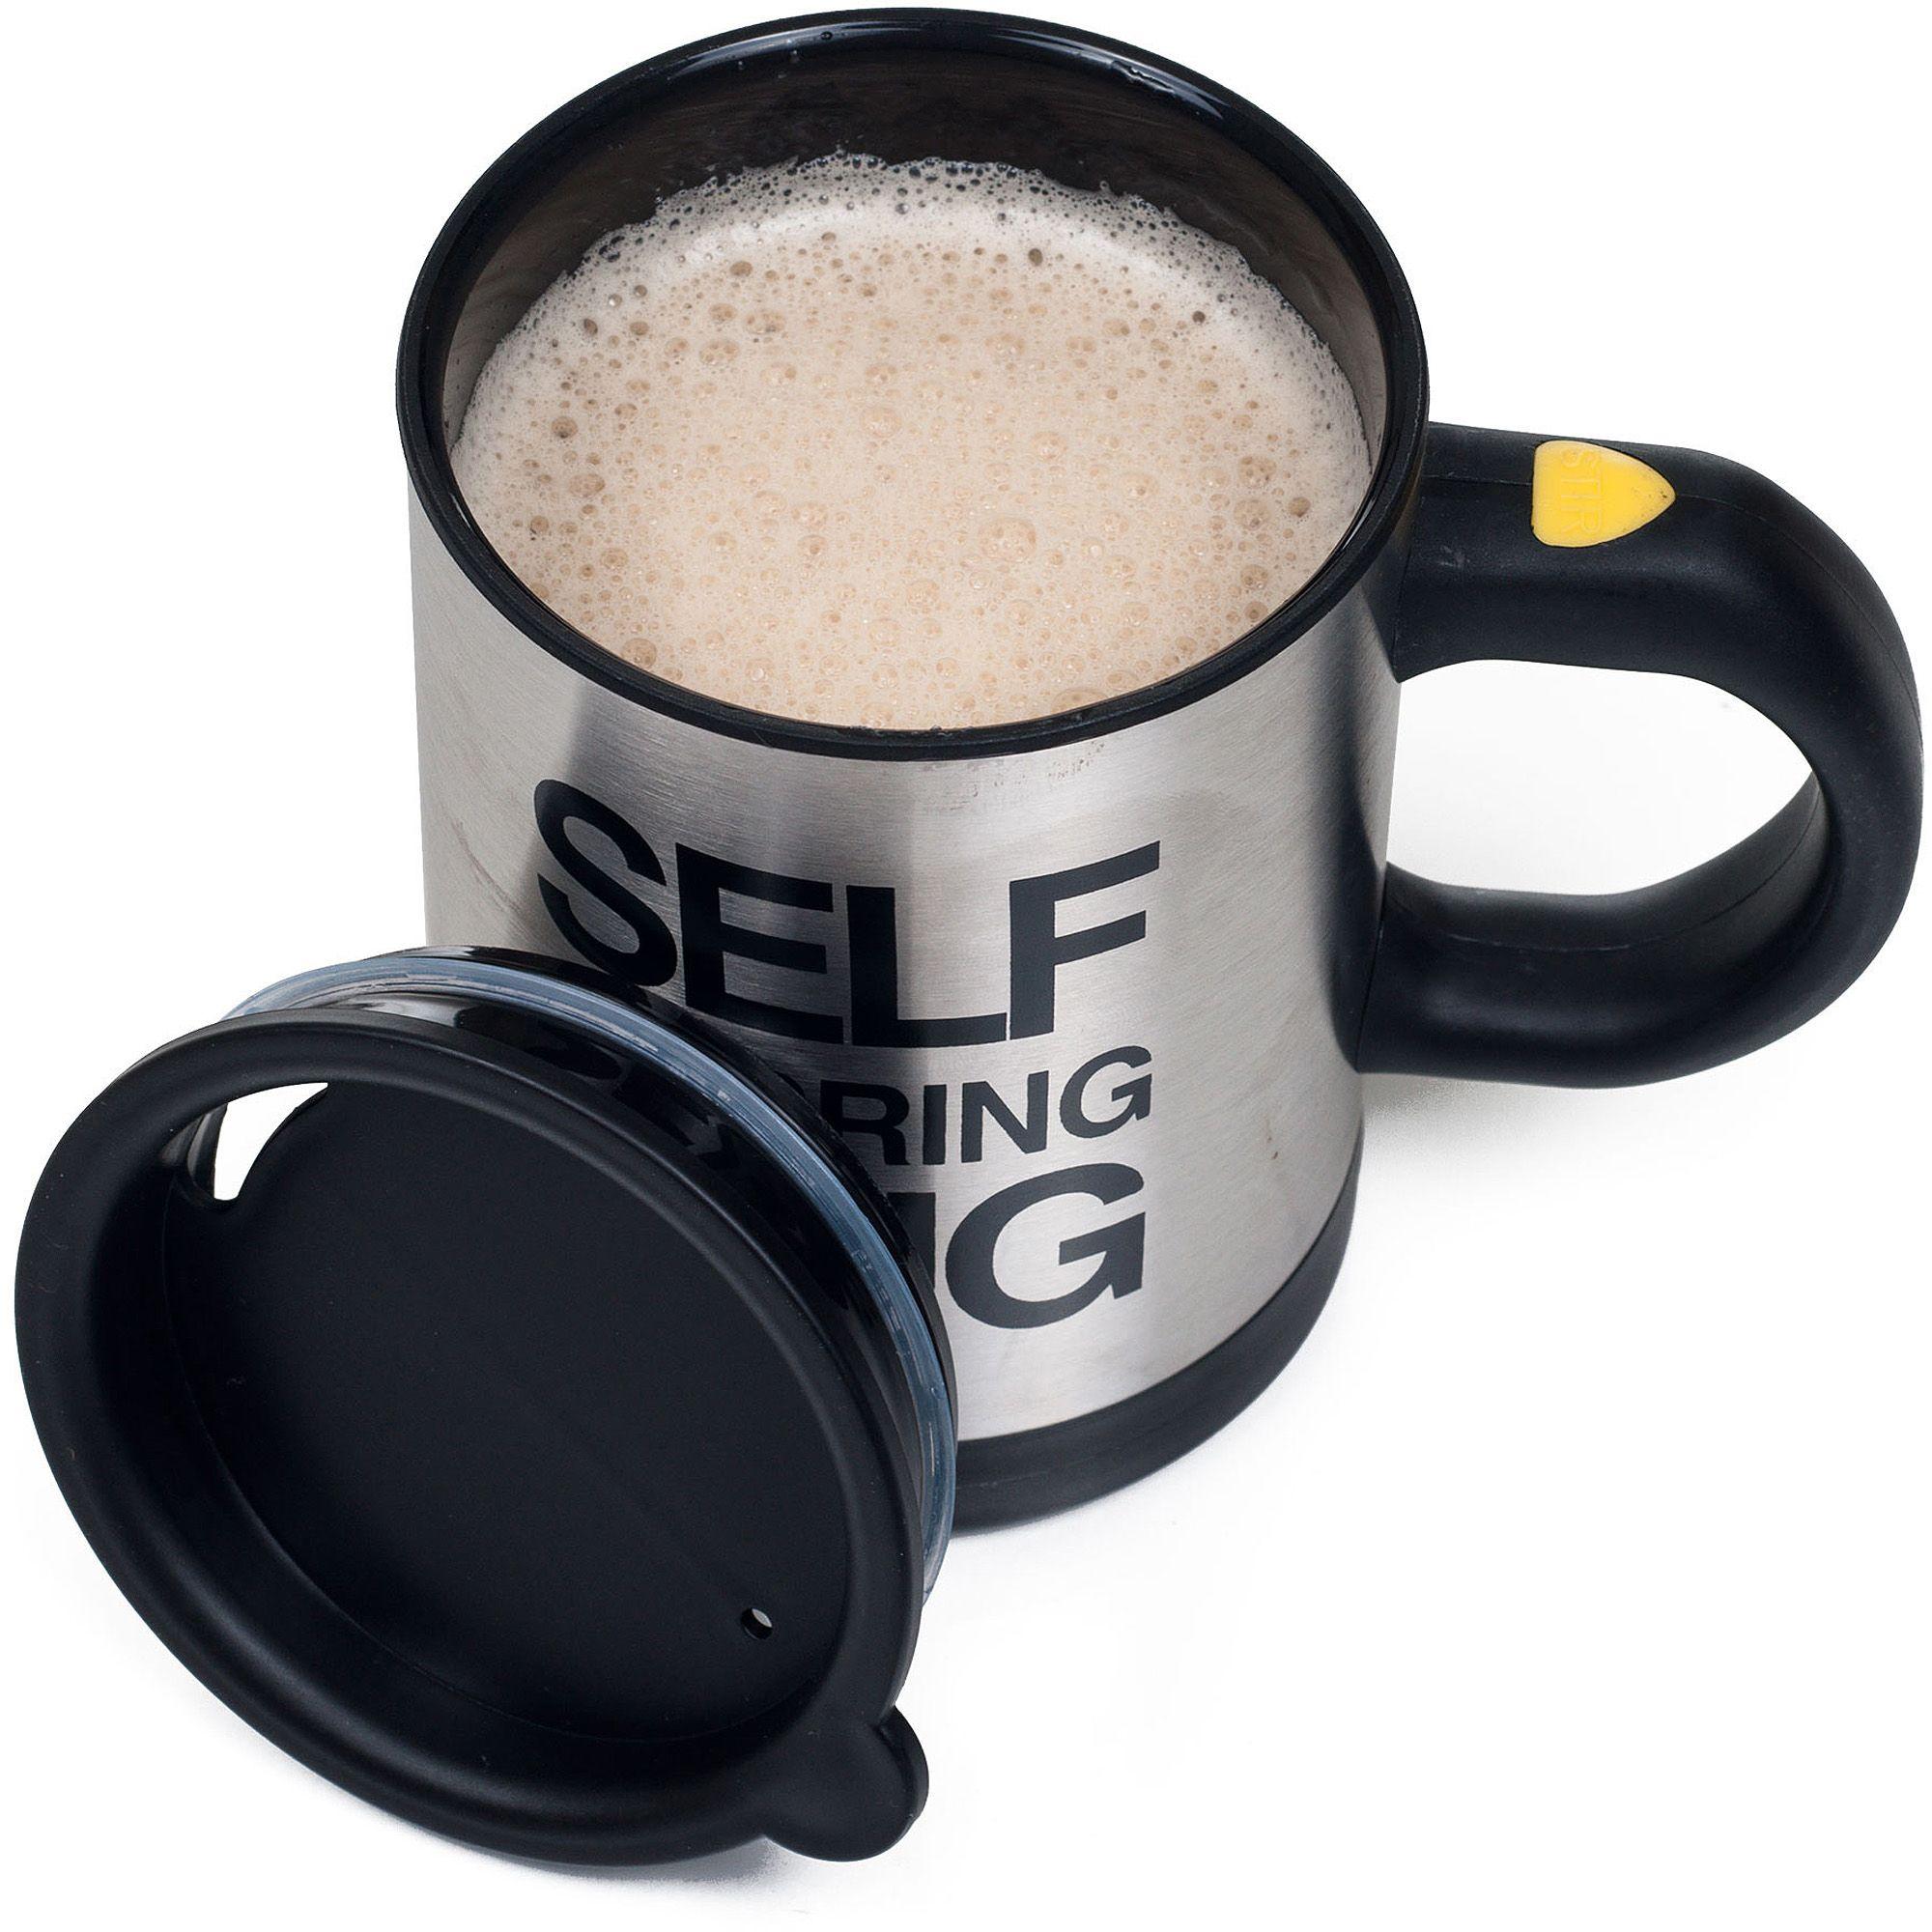 Sports & Outdoors Mugs, Chocolate mugs, Hot chocolate mug